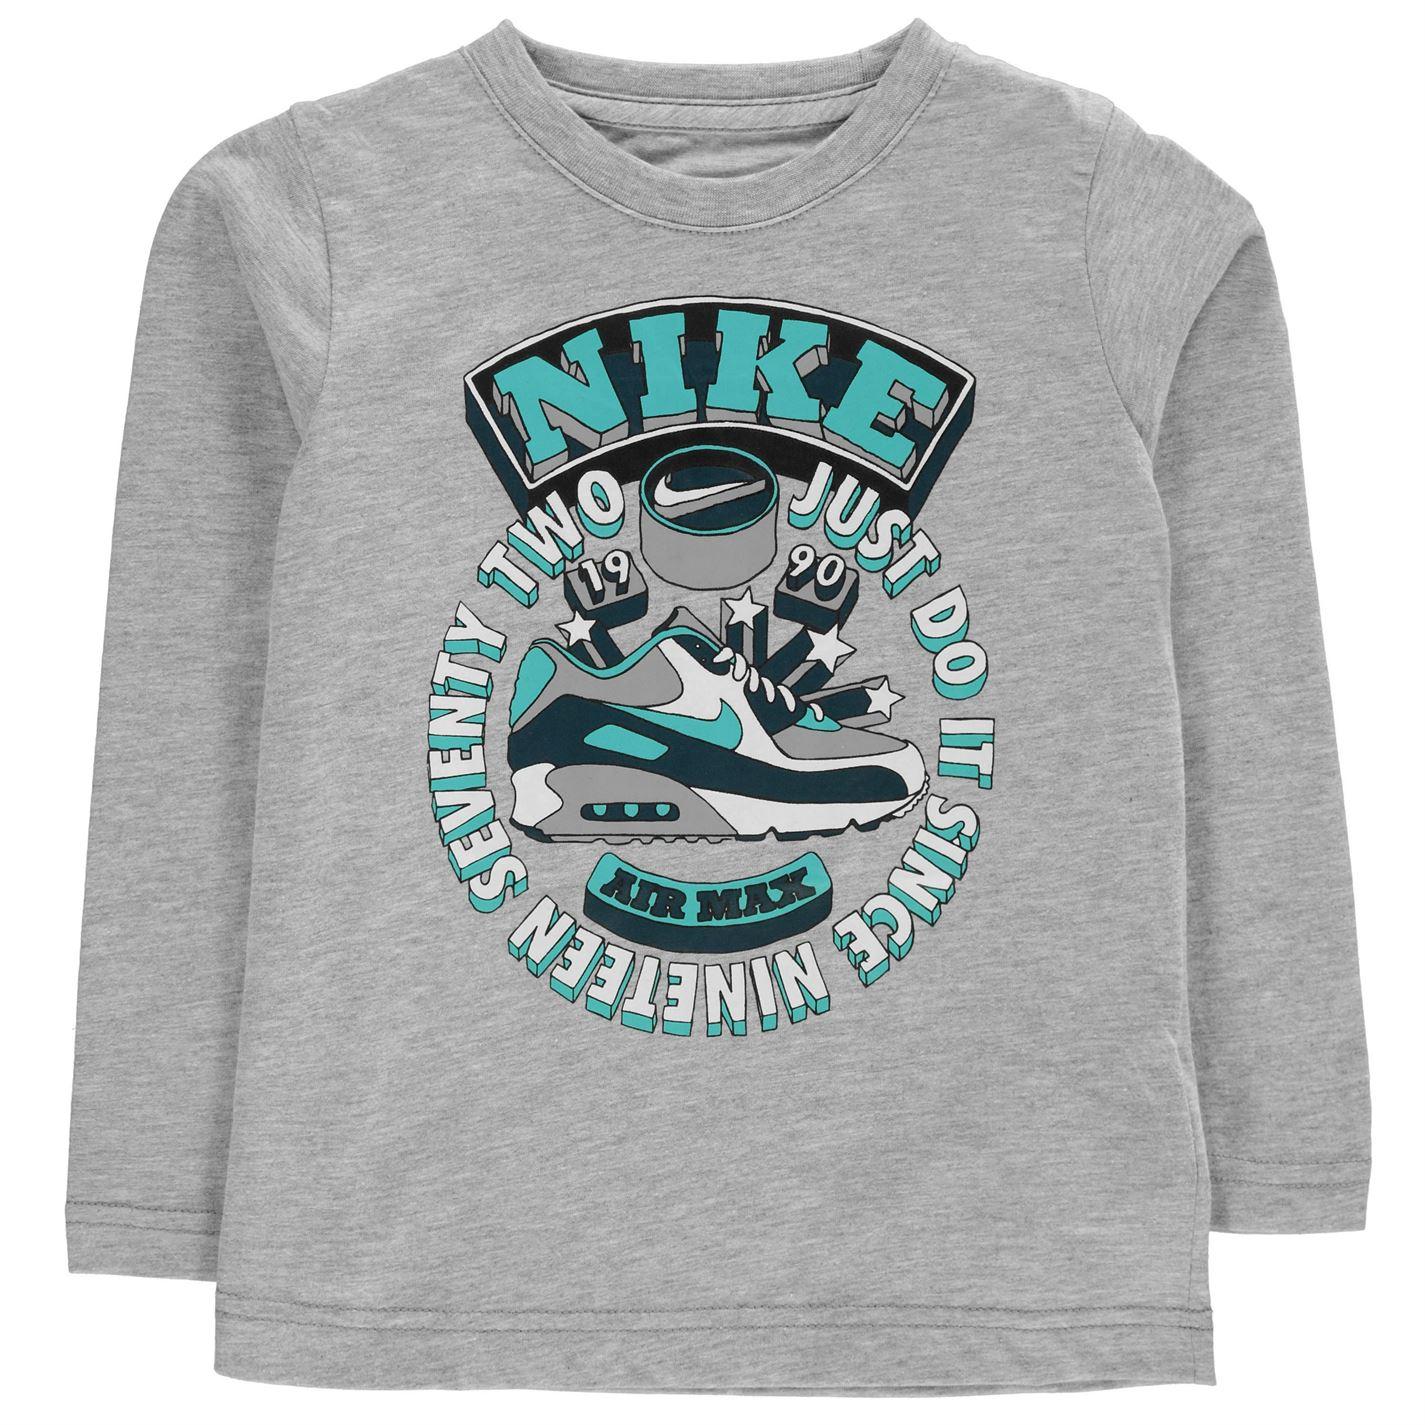 Nike Airmax T Shirt